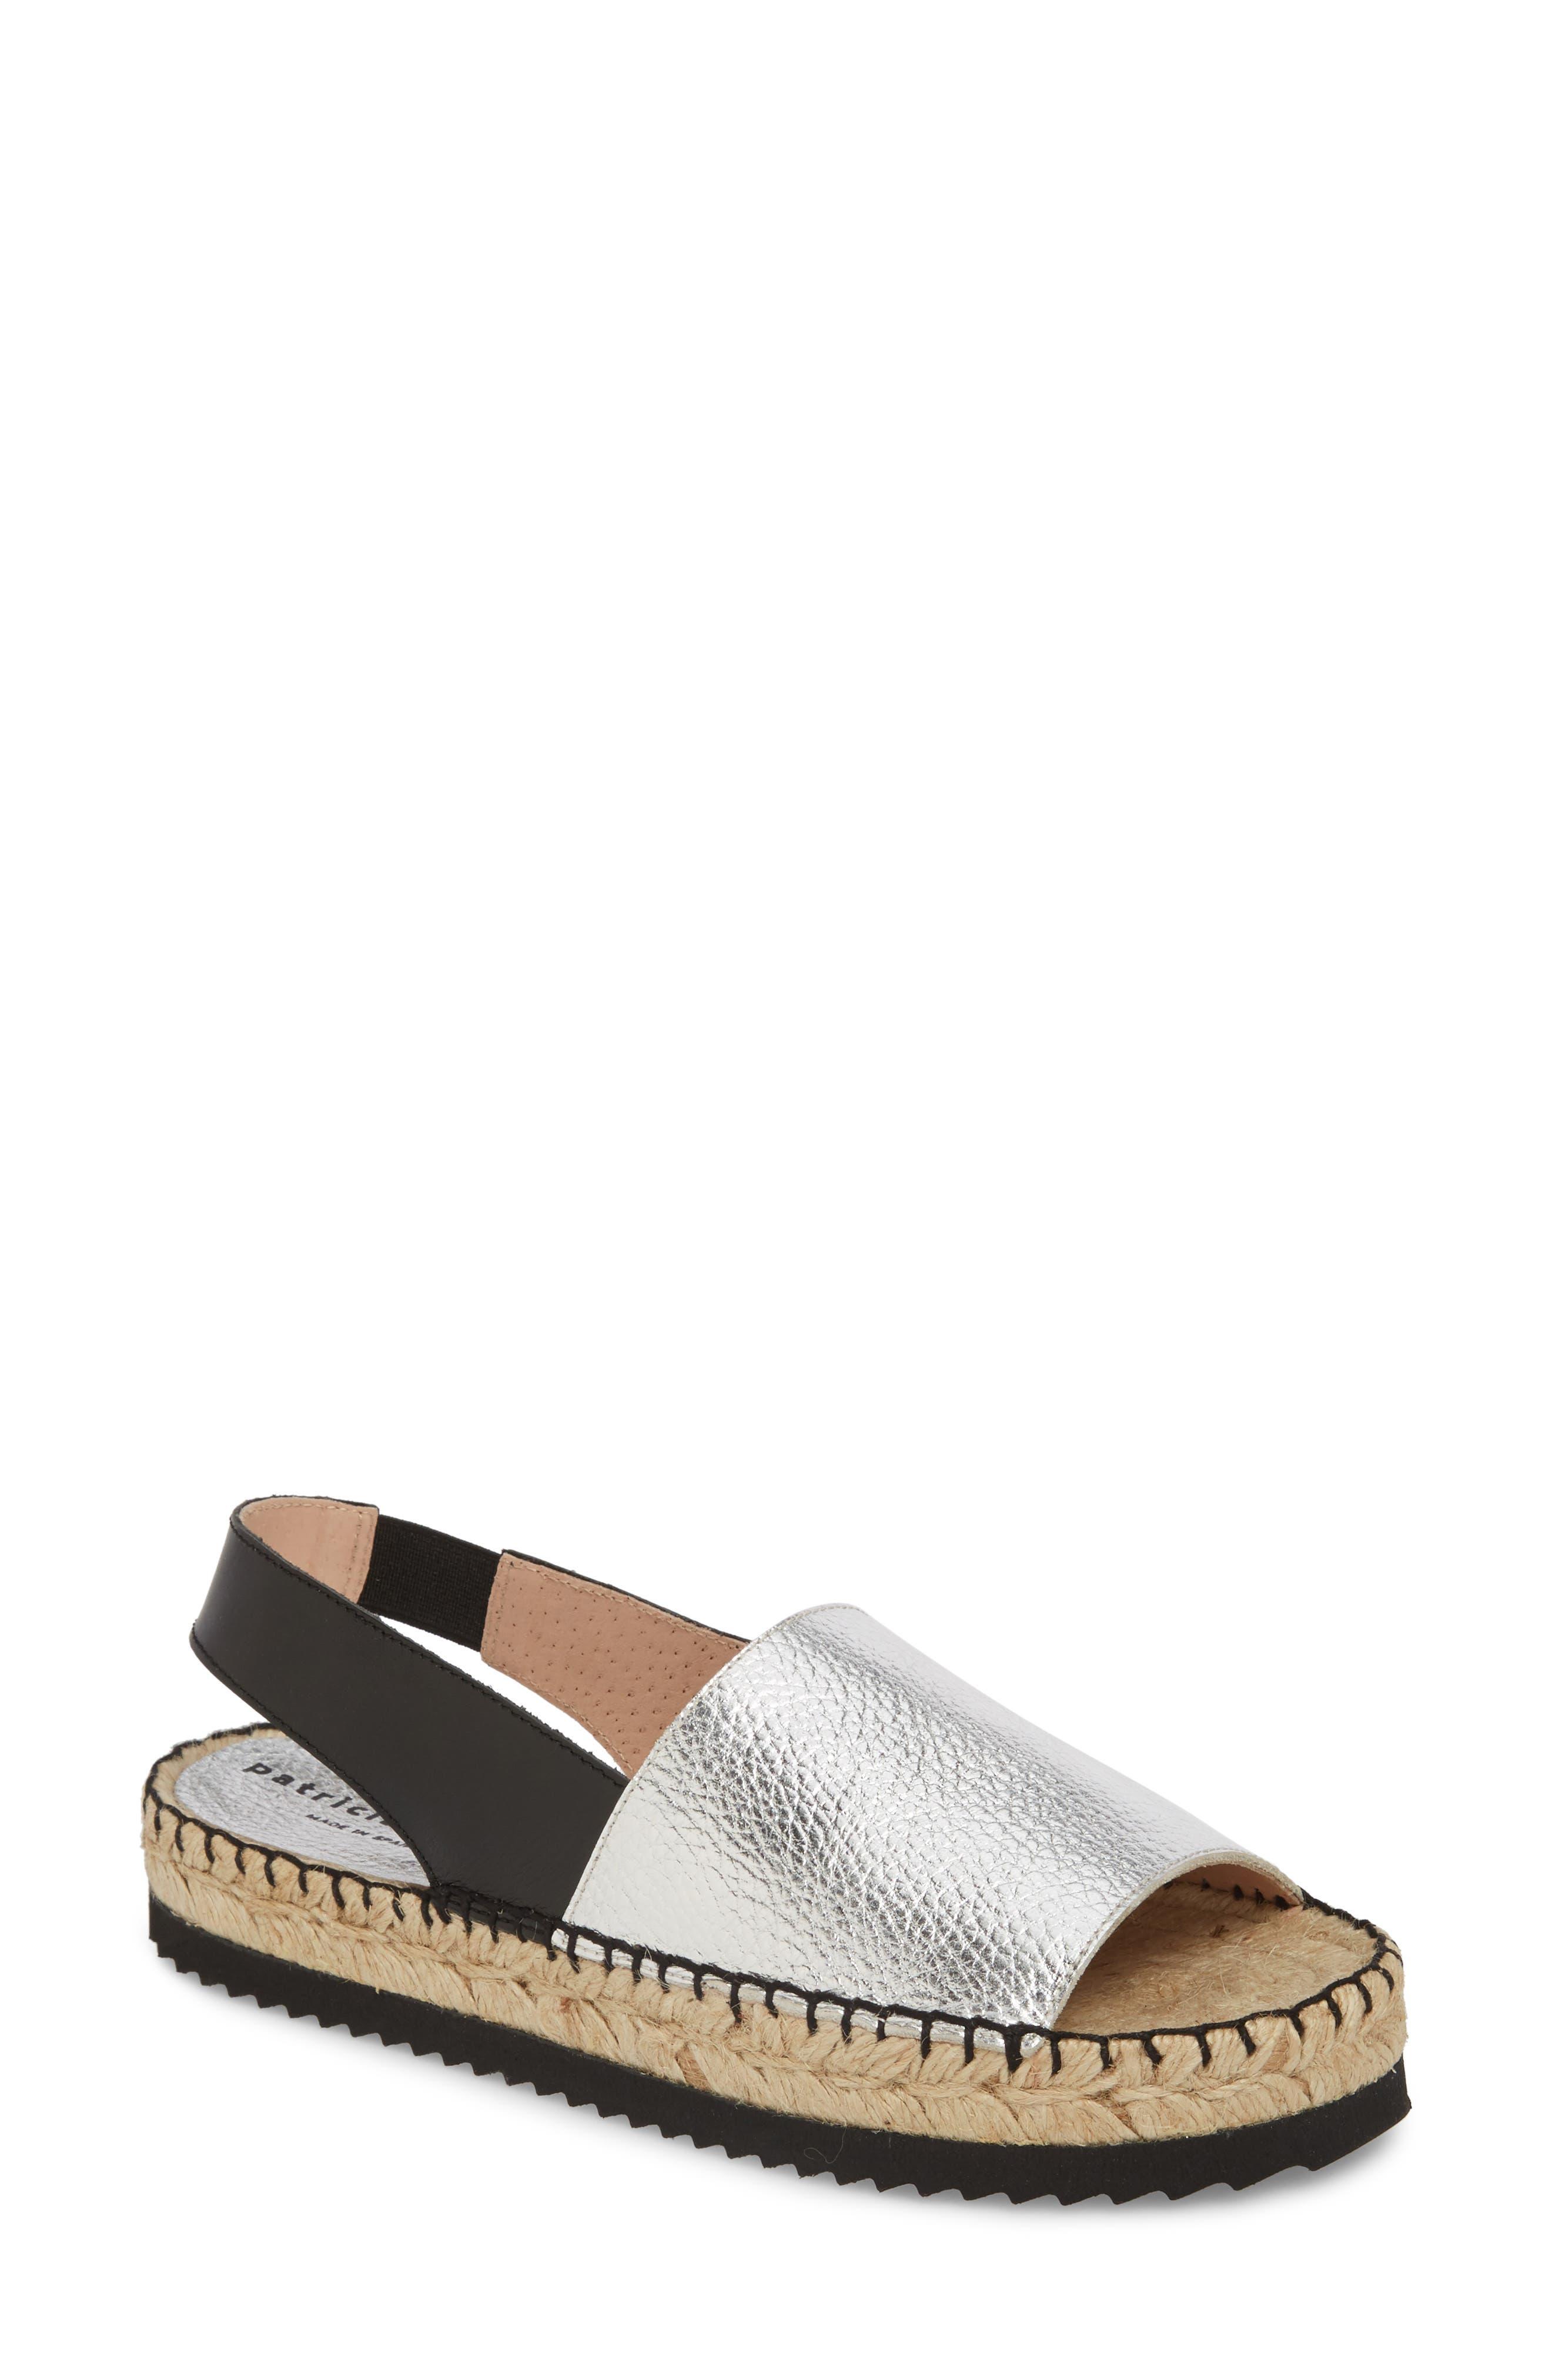 Patricia Green Soho Platform Espadrille Sandal, Metallic